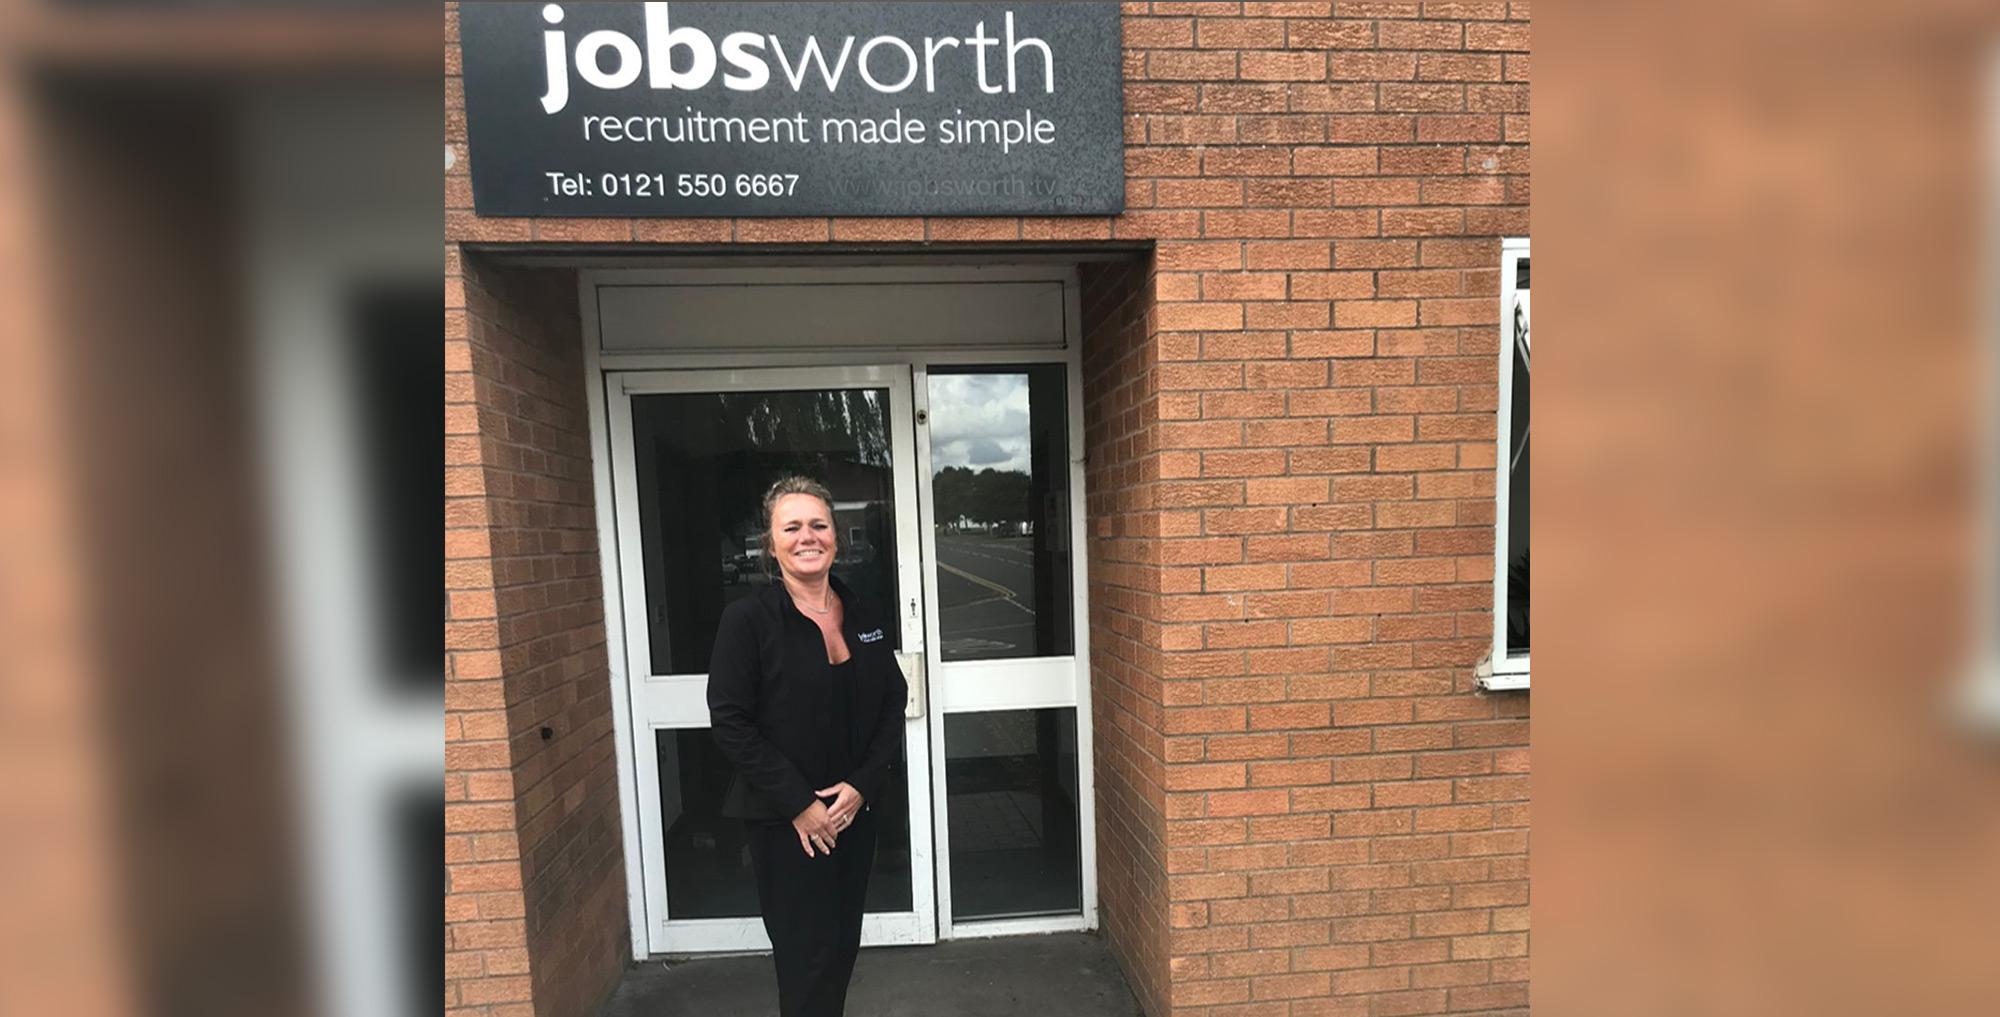 Employee standing infront of Jobsworth entrance